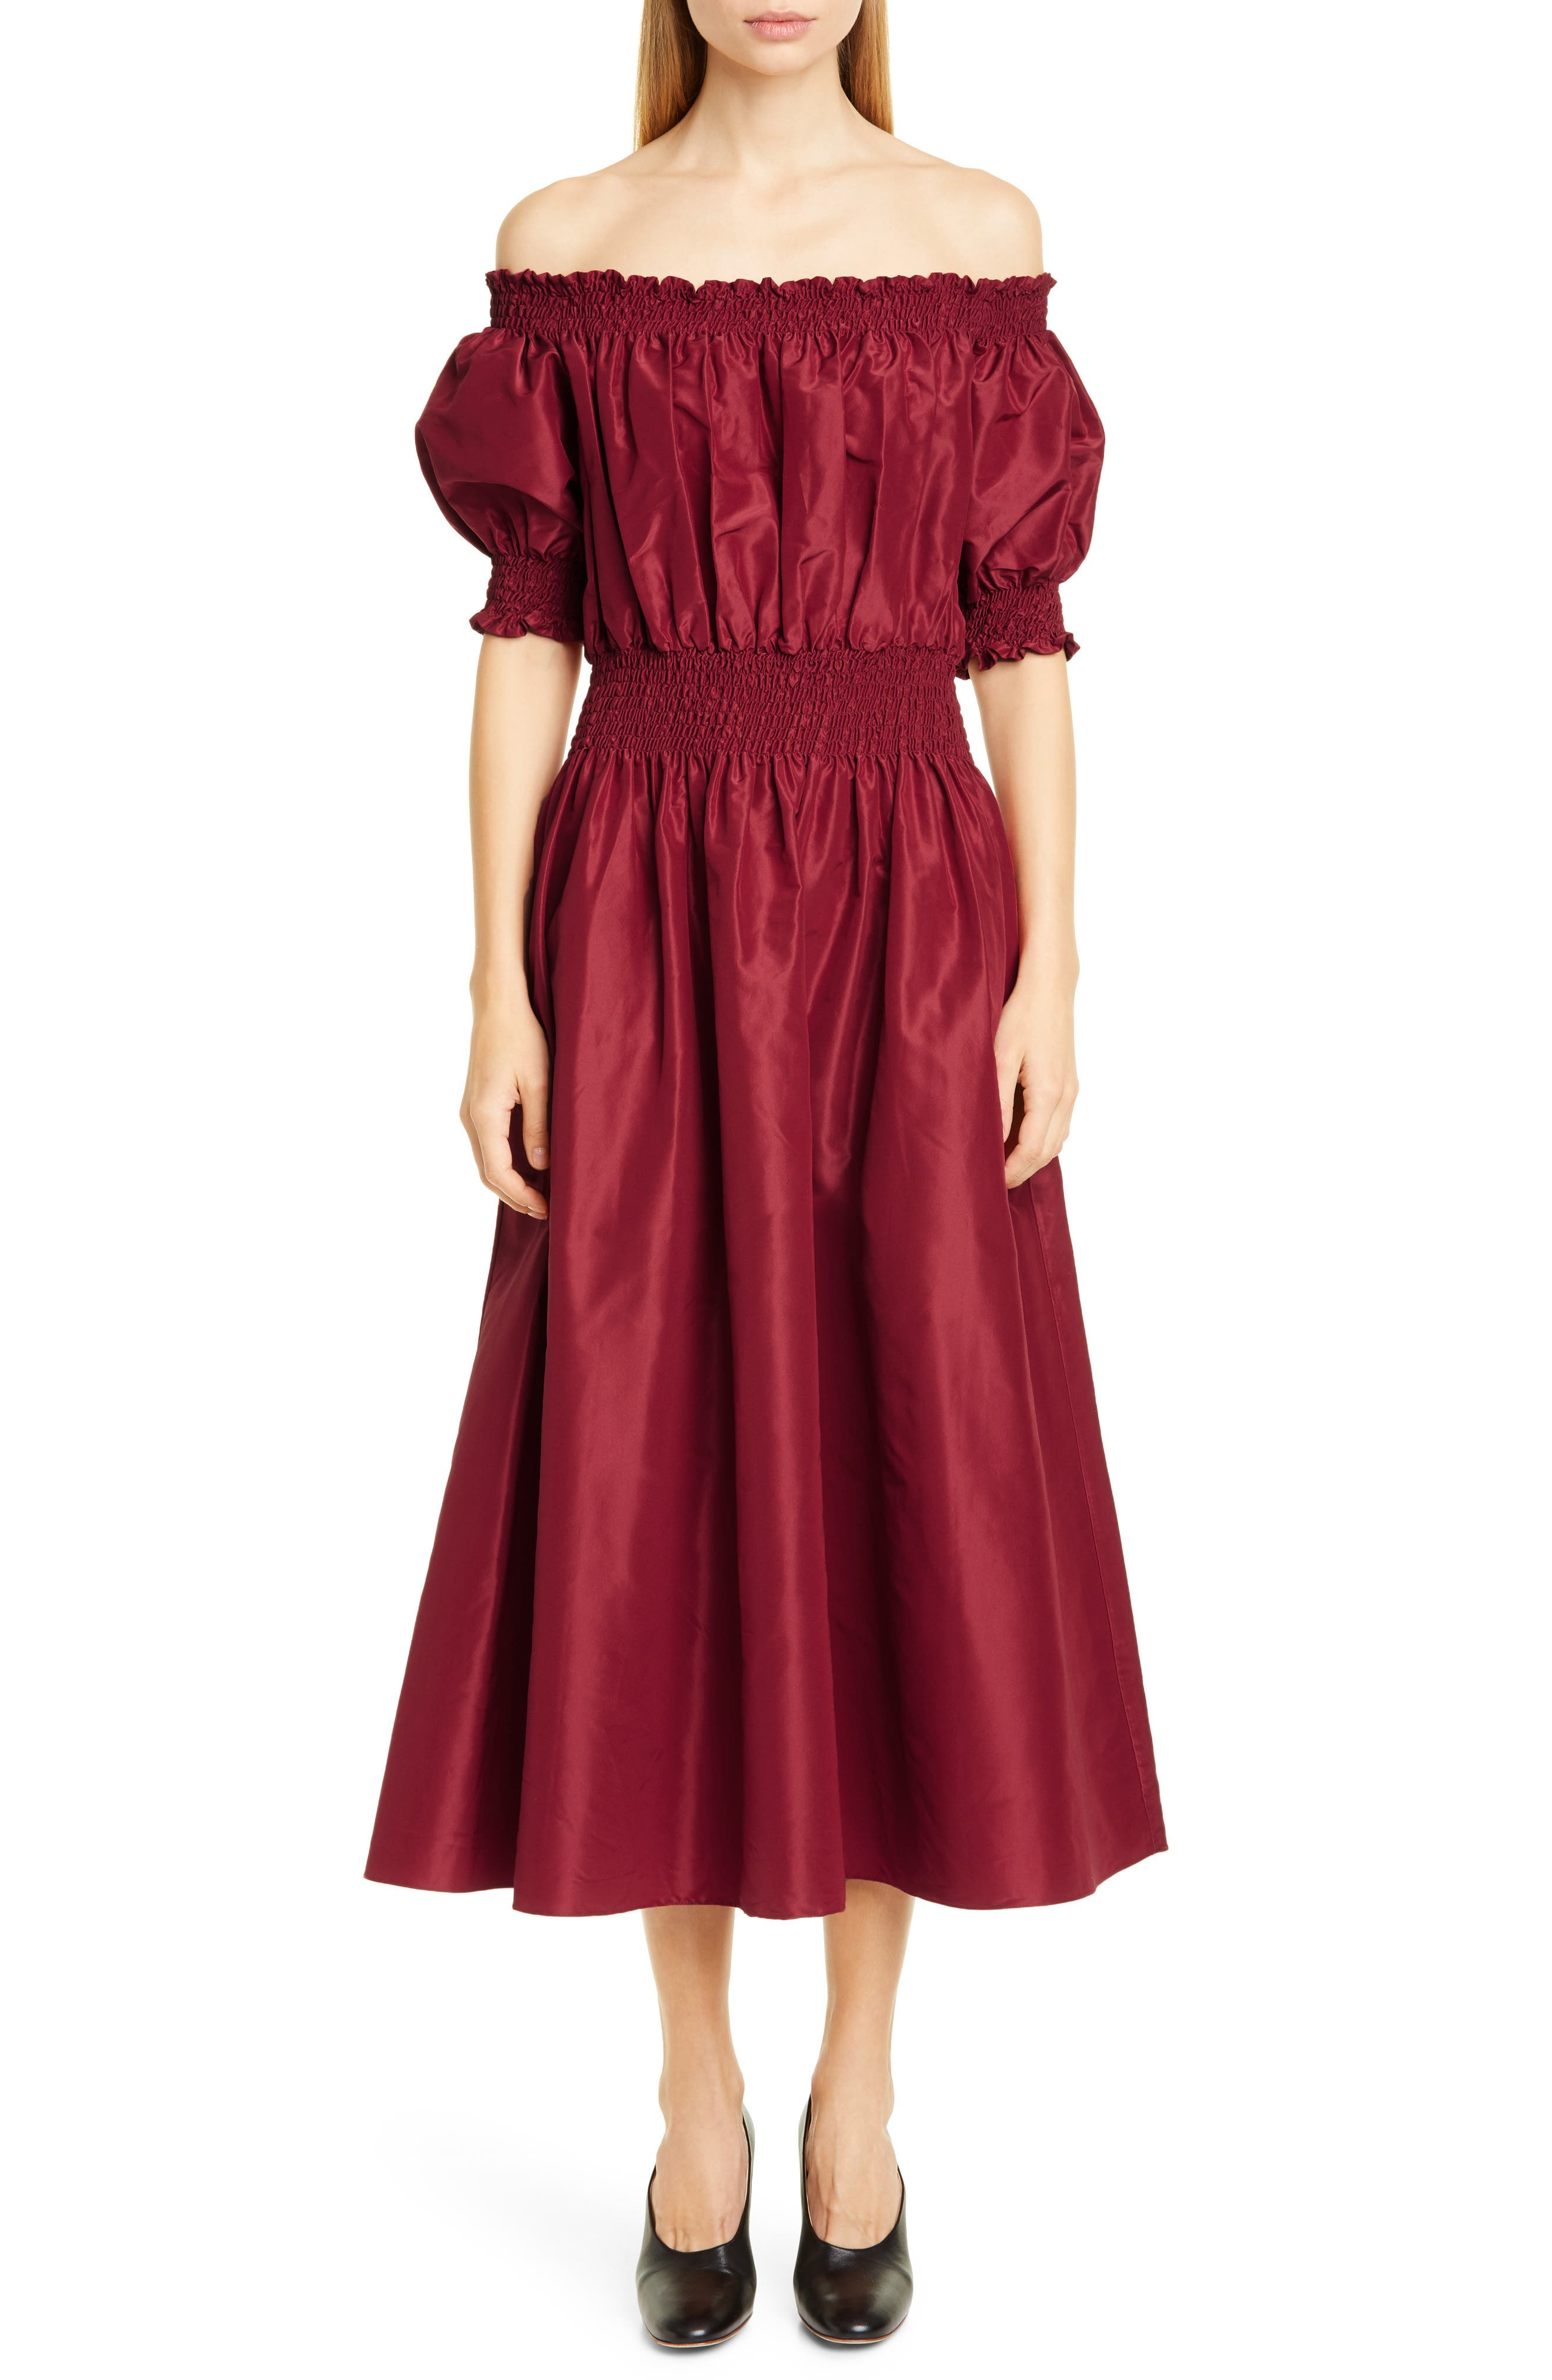 Adam Lippes Dresses Off the Shoulder Silk Taffeta Midi Dress